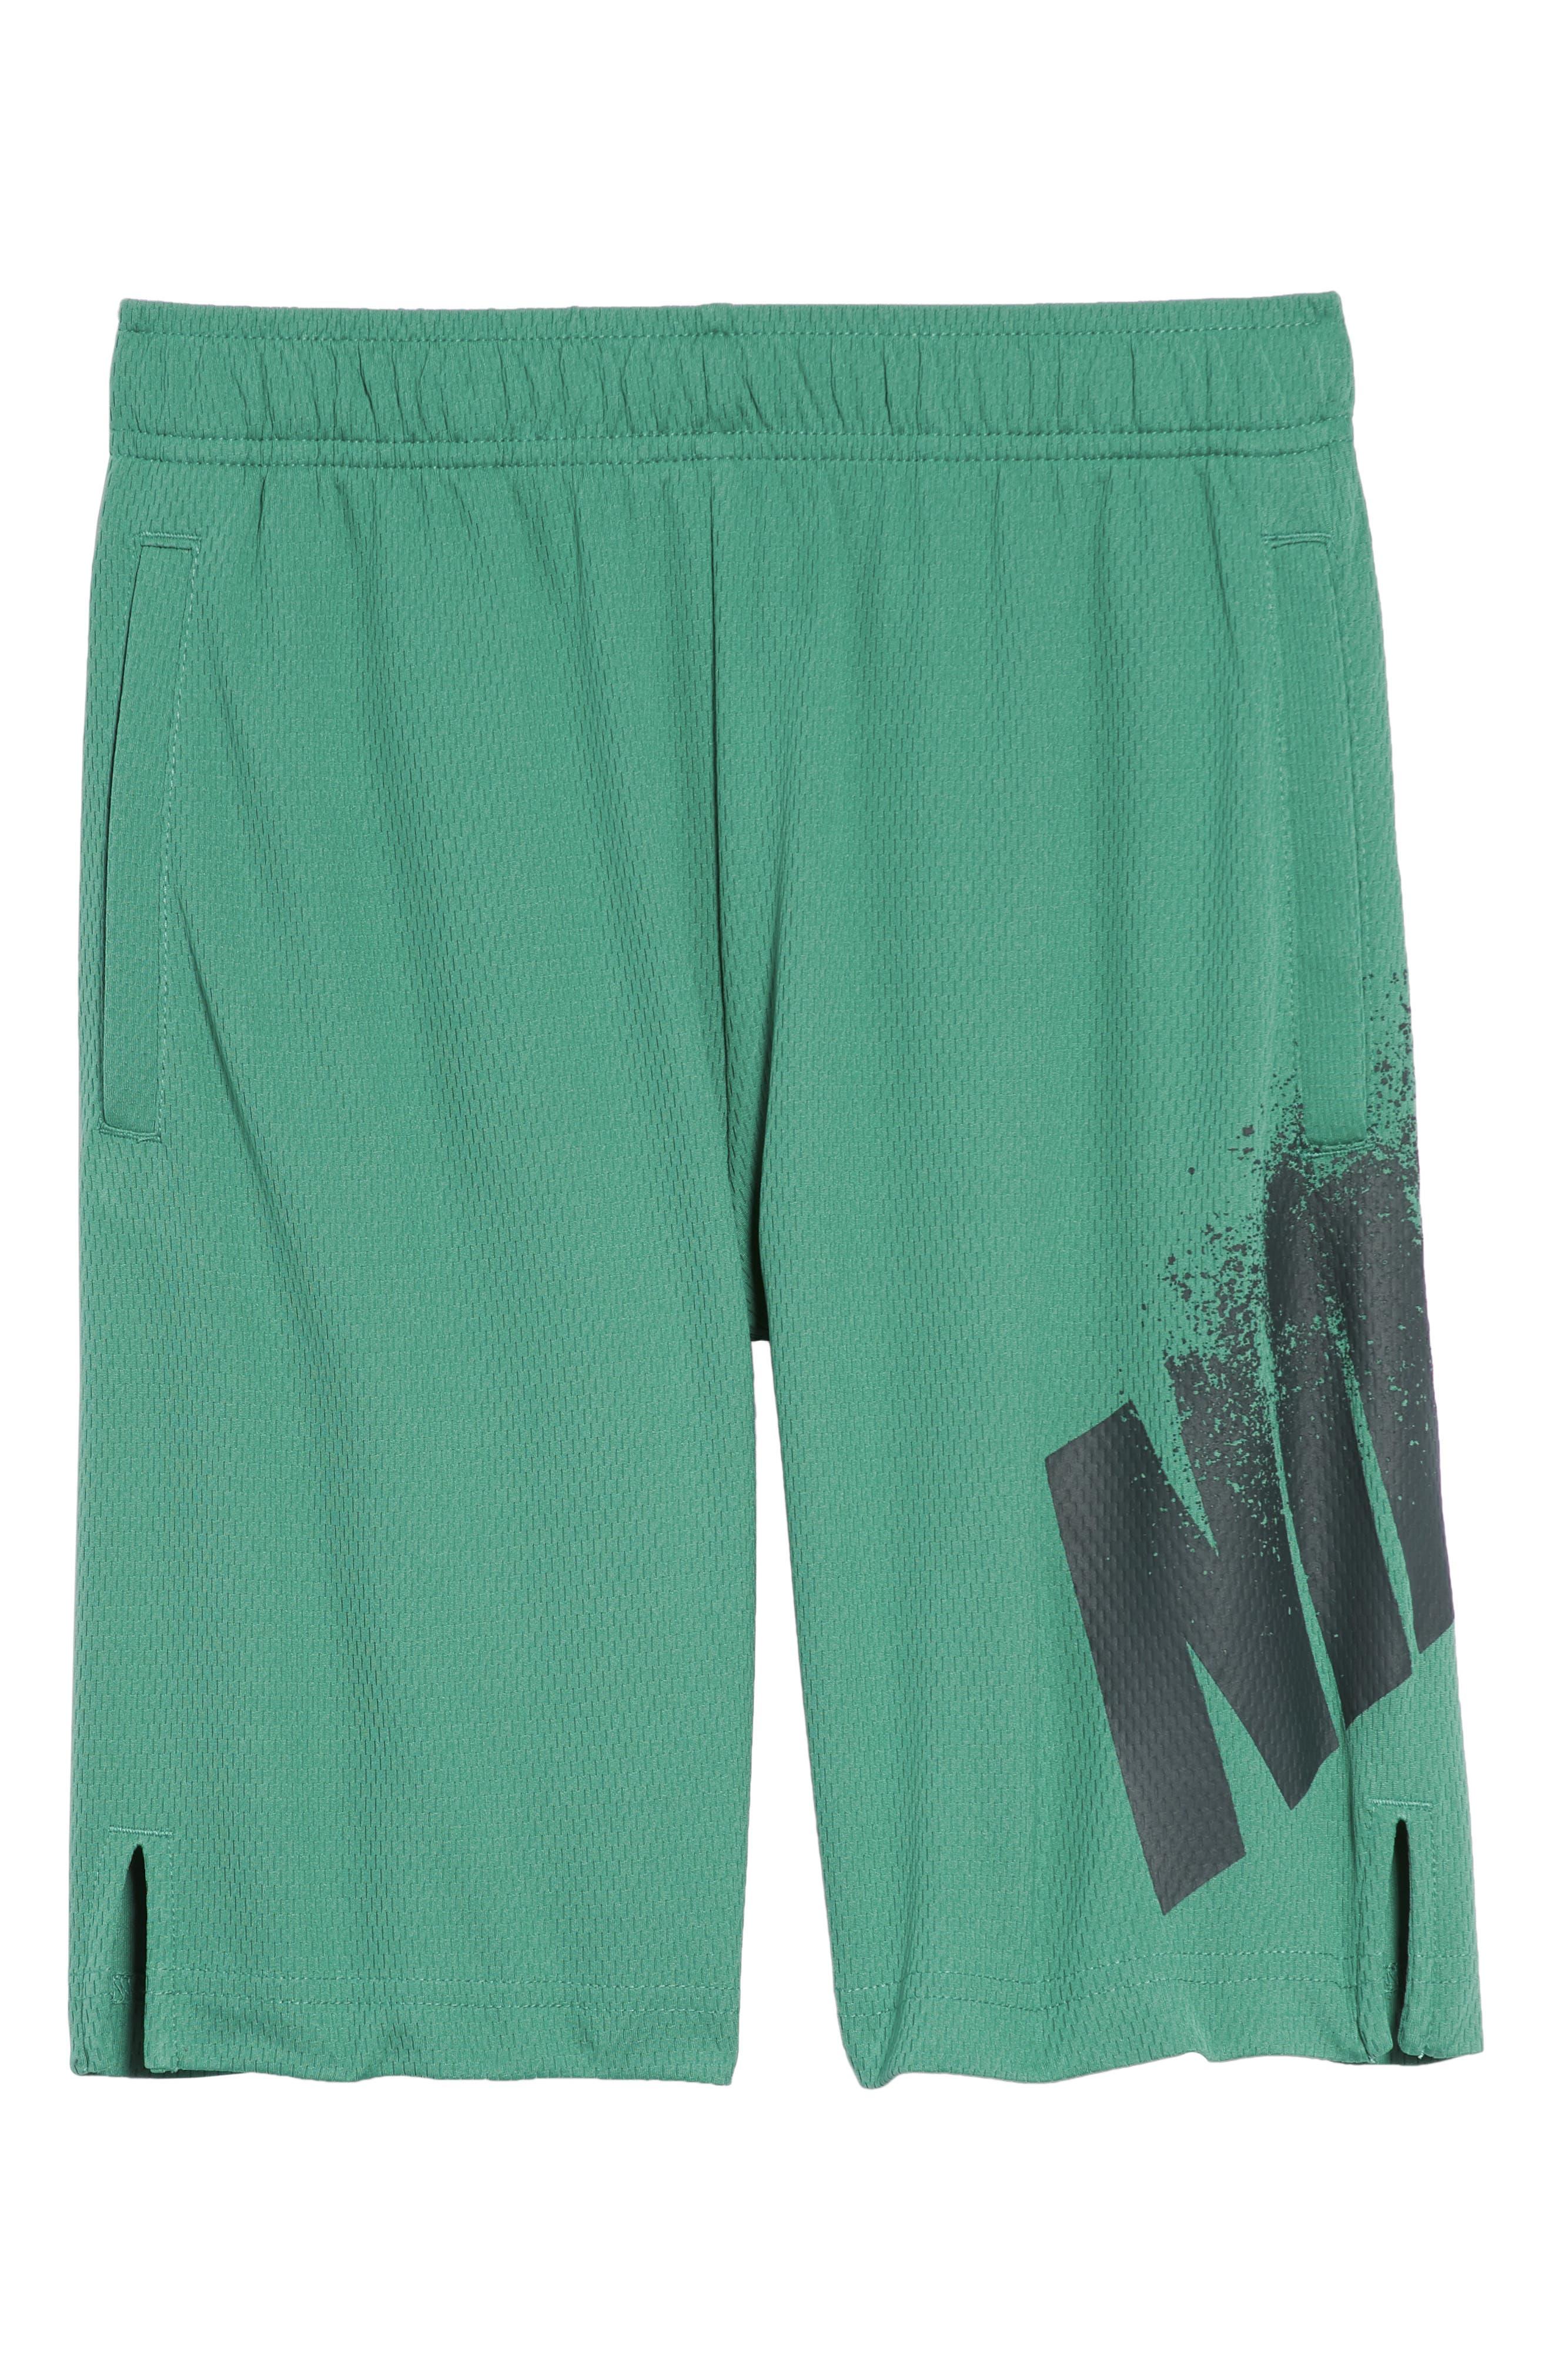 Dry GFX Athletic Shorts,                         Main,                         color, Green Noise/ Deep Jungle